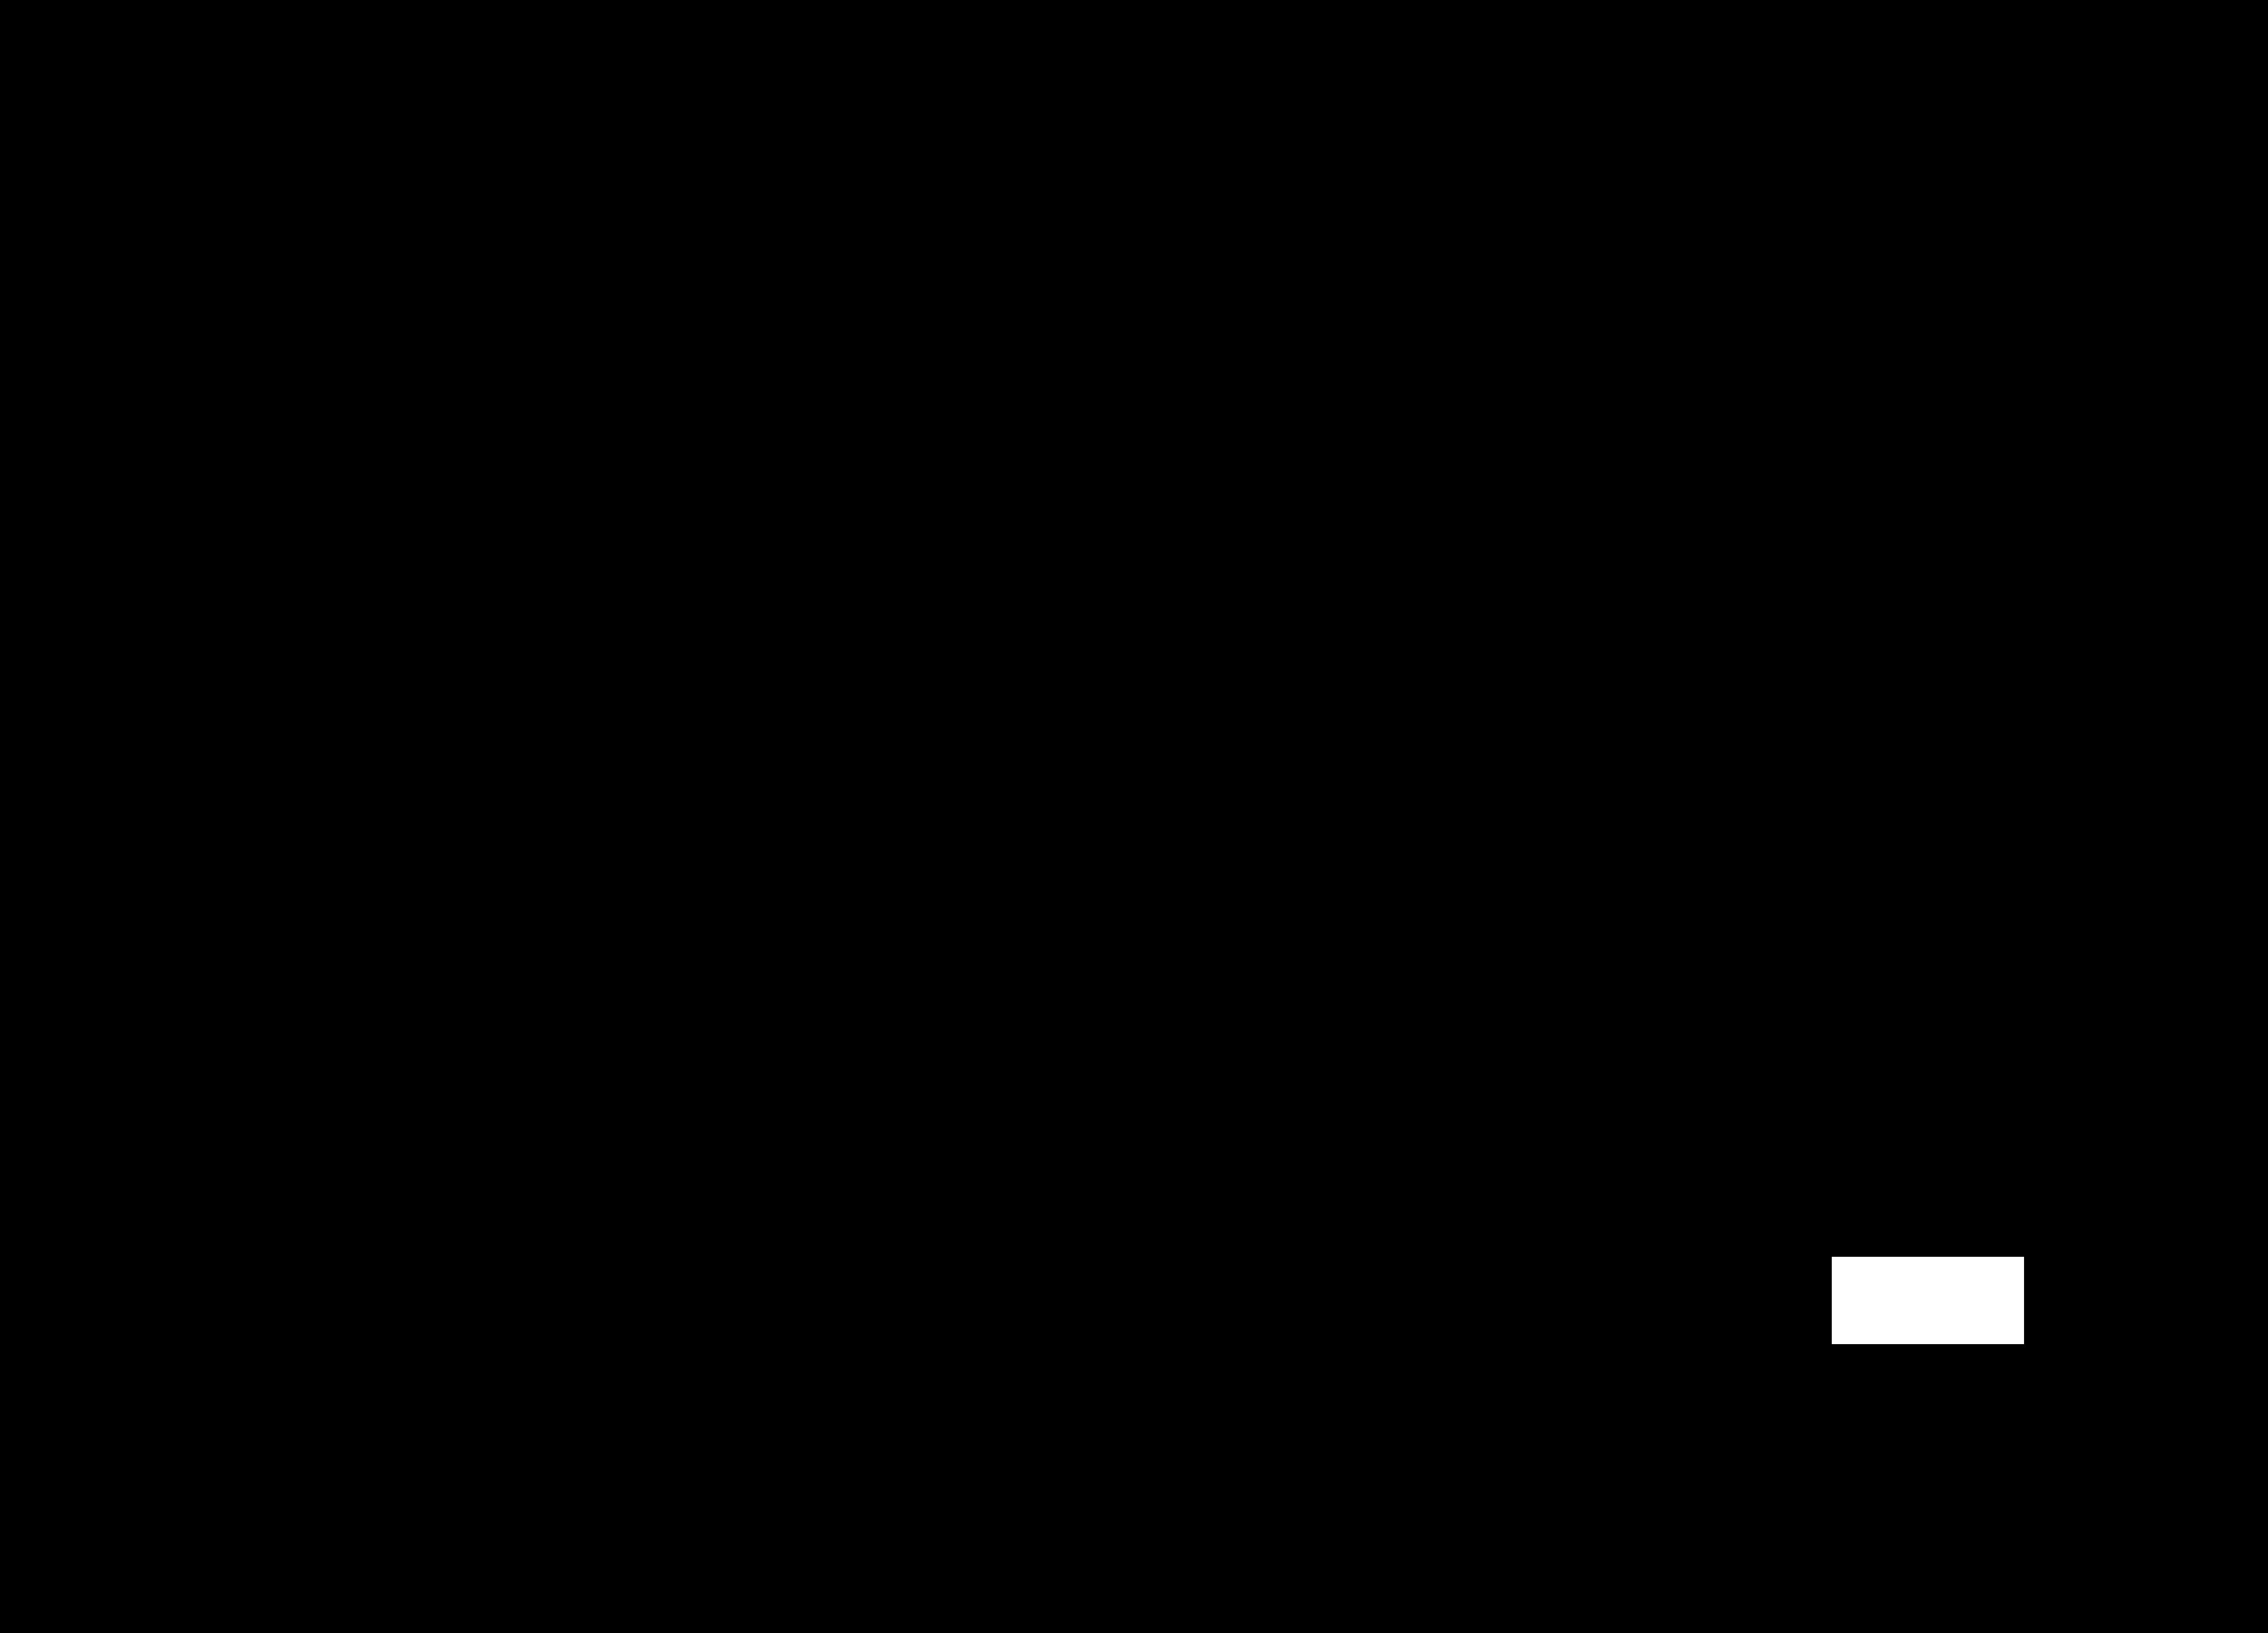 Apex Legends Logo High Resolution Png Image In 2020 Legend Apex Png Images